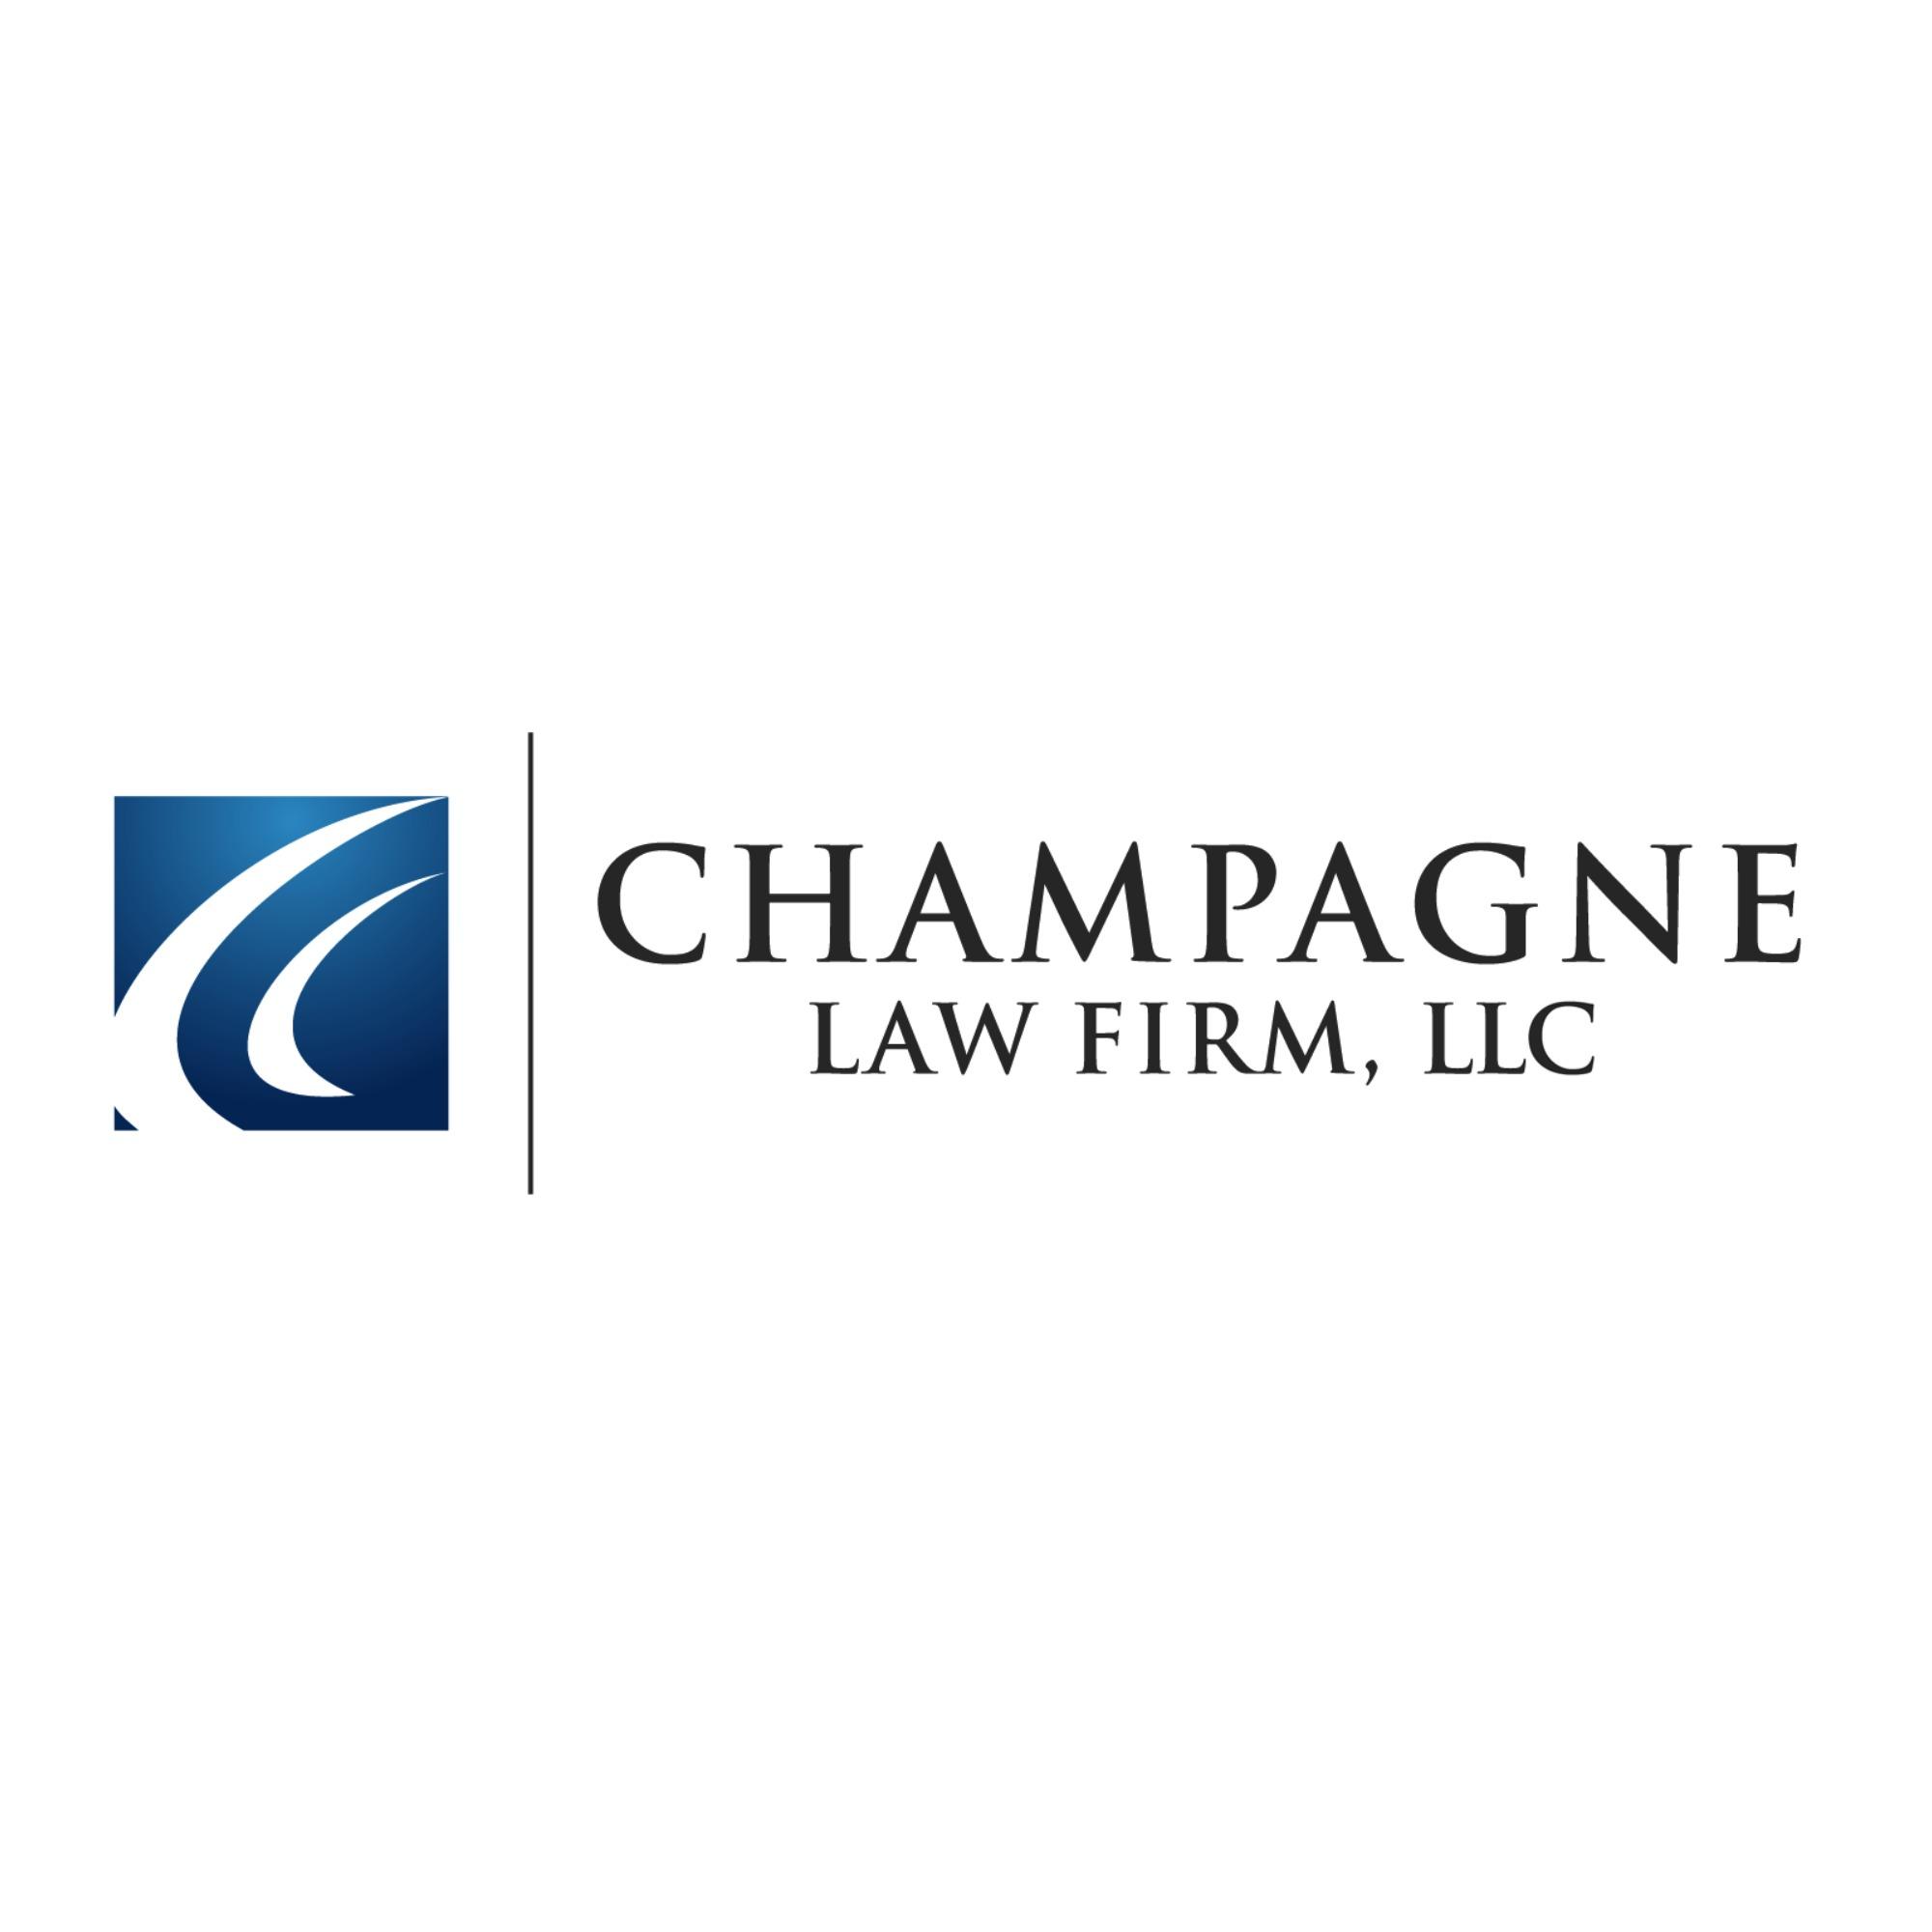 https://www.facebook.com/ChampagneLawFirm/?fref=ts